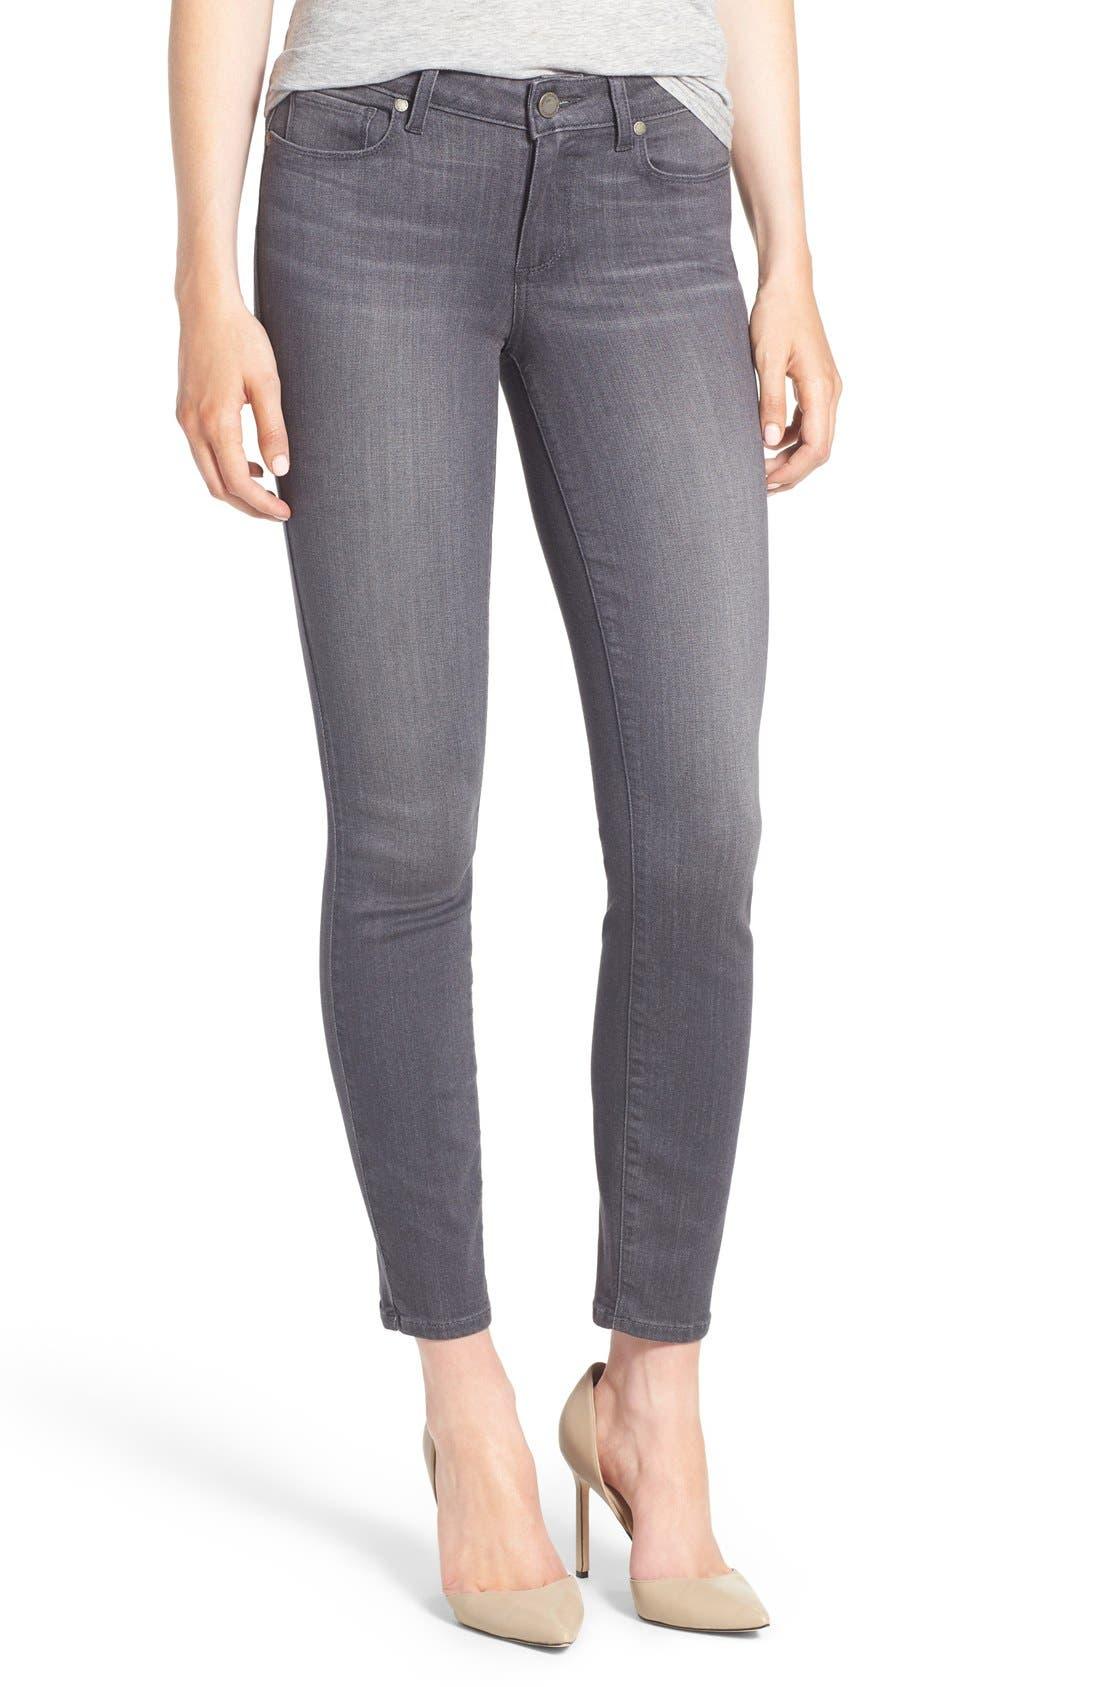 Alternate Image 1 Selected - PAIGE Transcend - Verdugo Ankle Jeans (Bonnie Grey) (Nordstrom Exclusive)